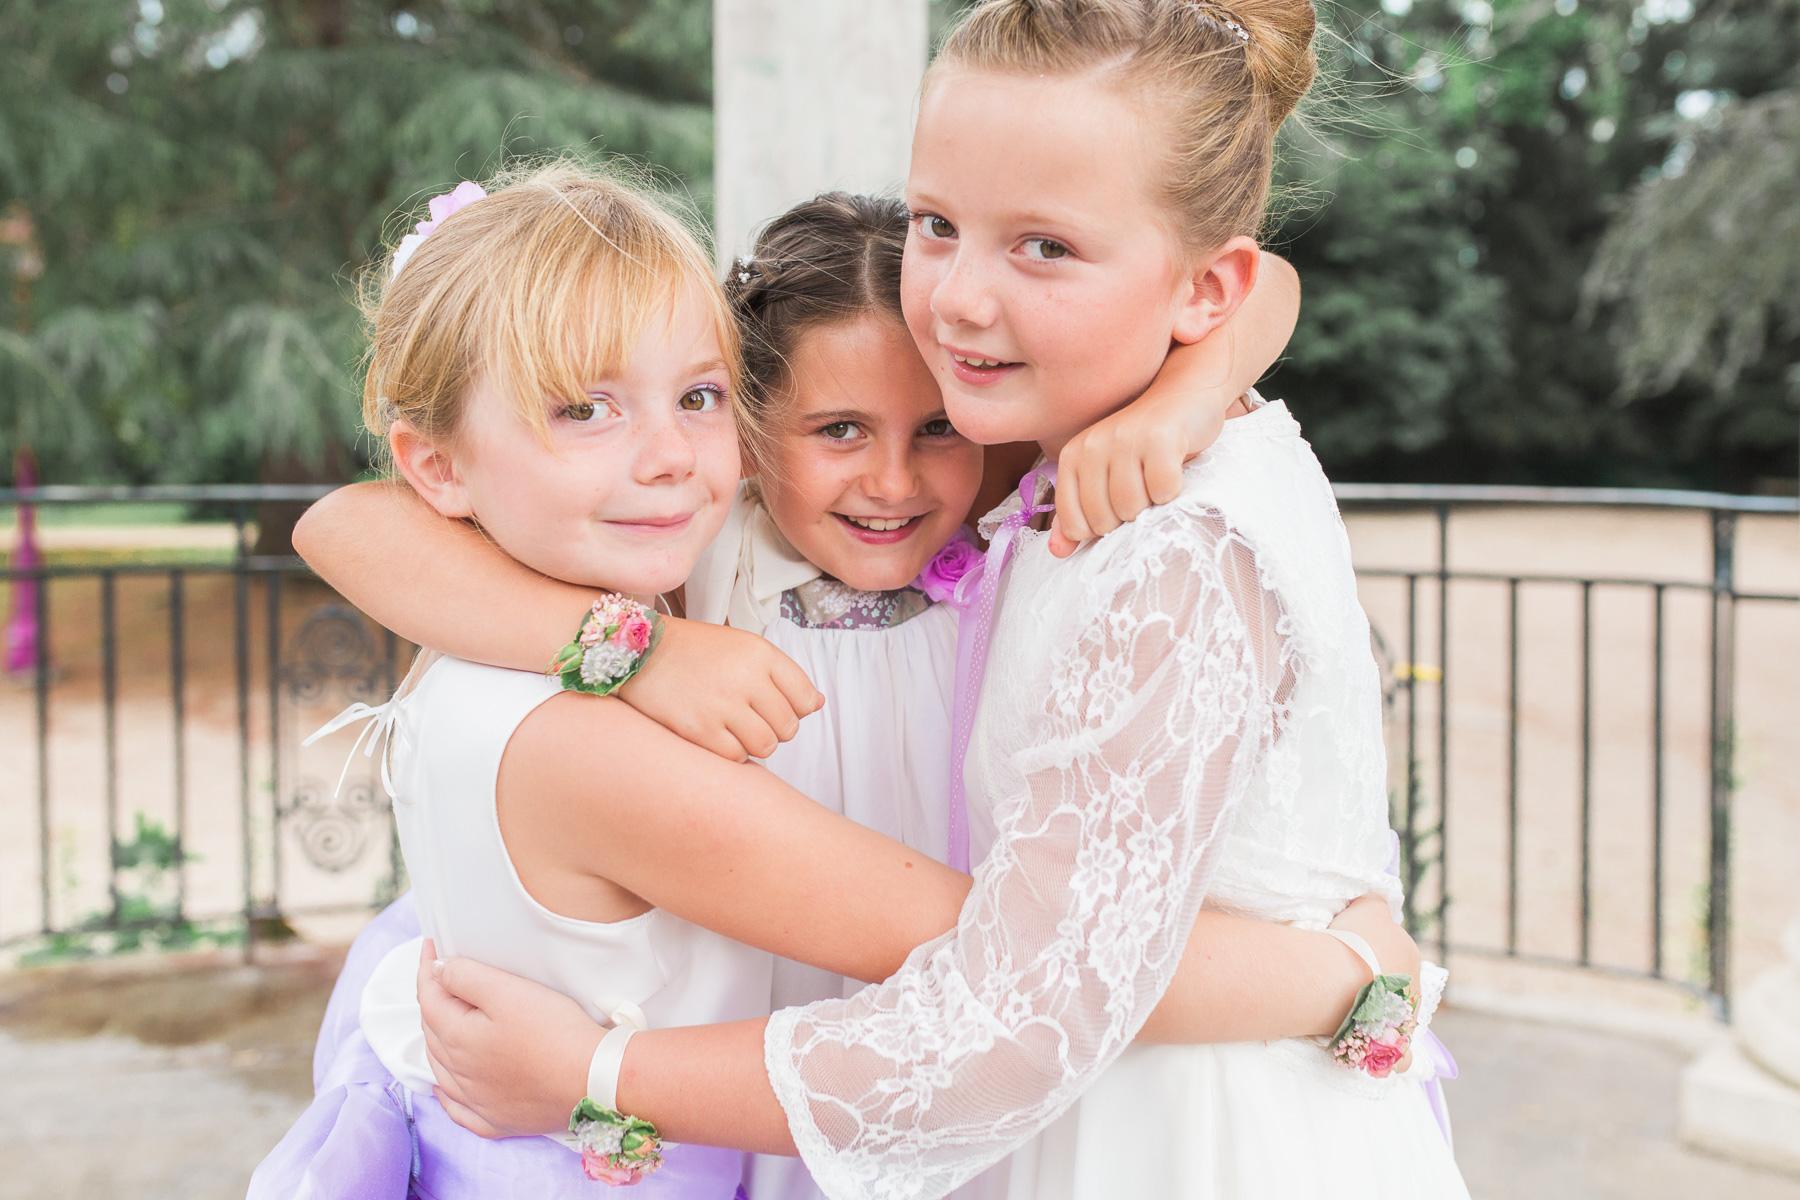 Gaelle Bizeul, photographe mariage, enfant